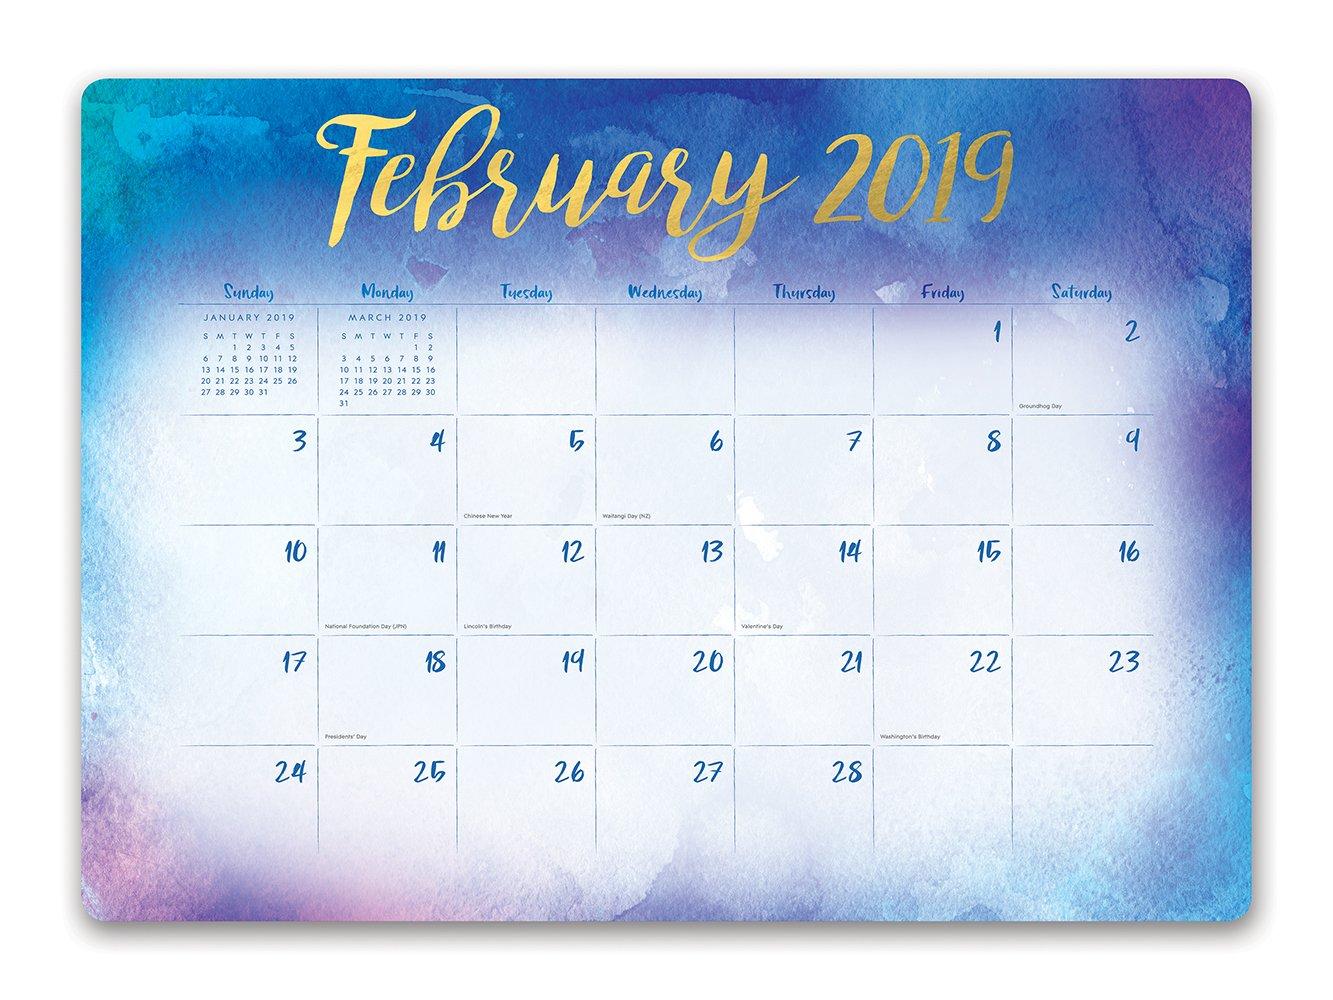 Orange Circle Studio 2019 Decorative Desk Blotter Calendar, August 2018 - December 2019, Aquarelle